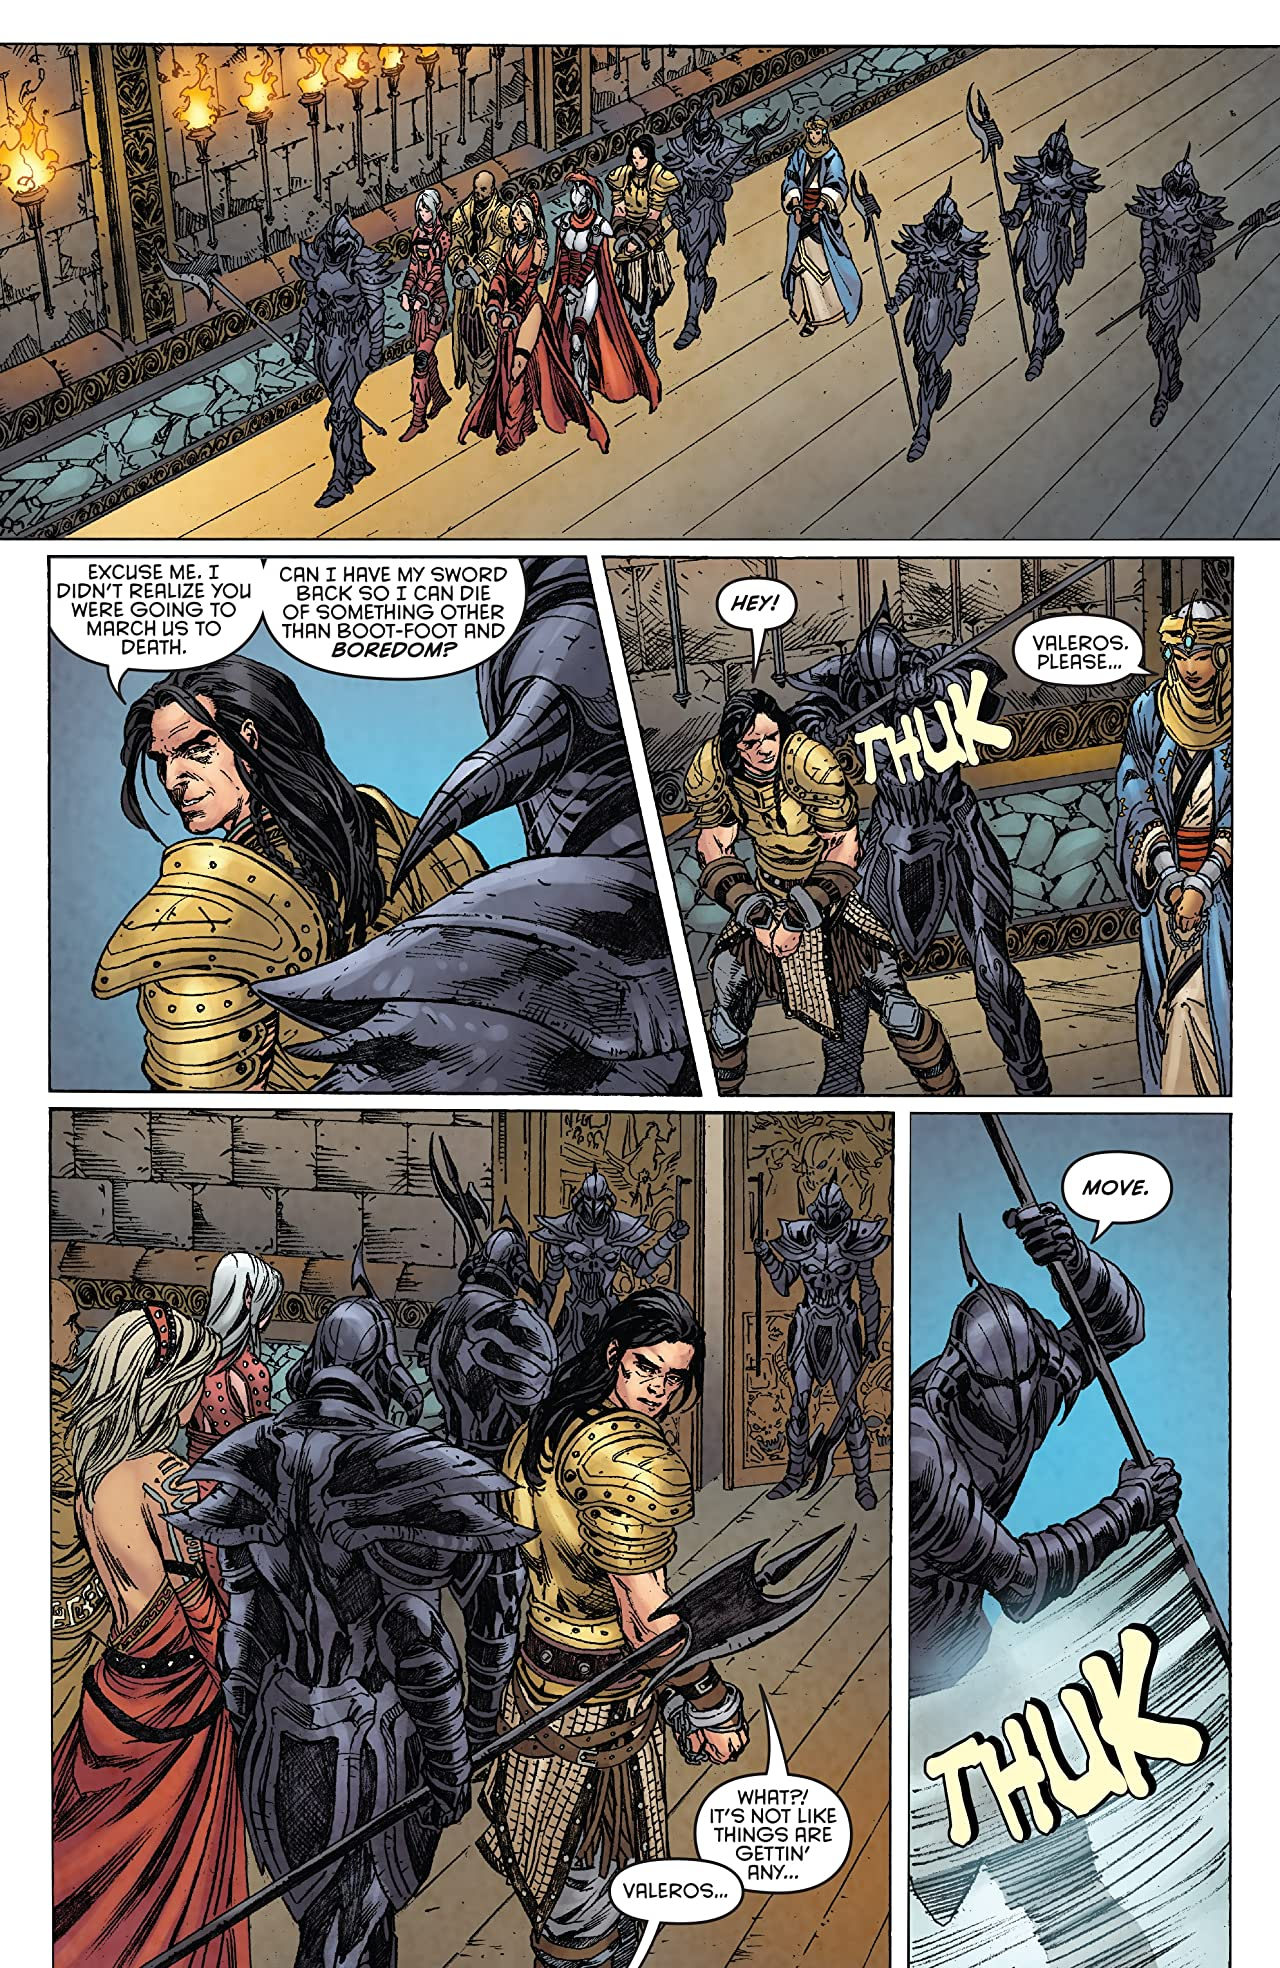 Pathfinder: Runescars #3